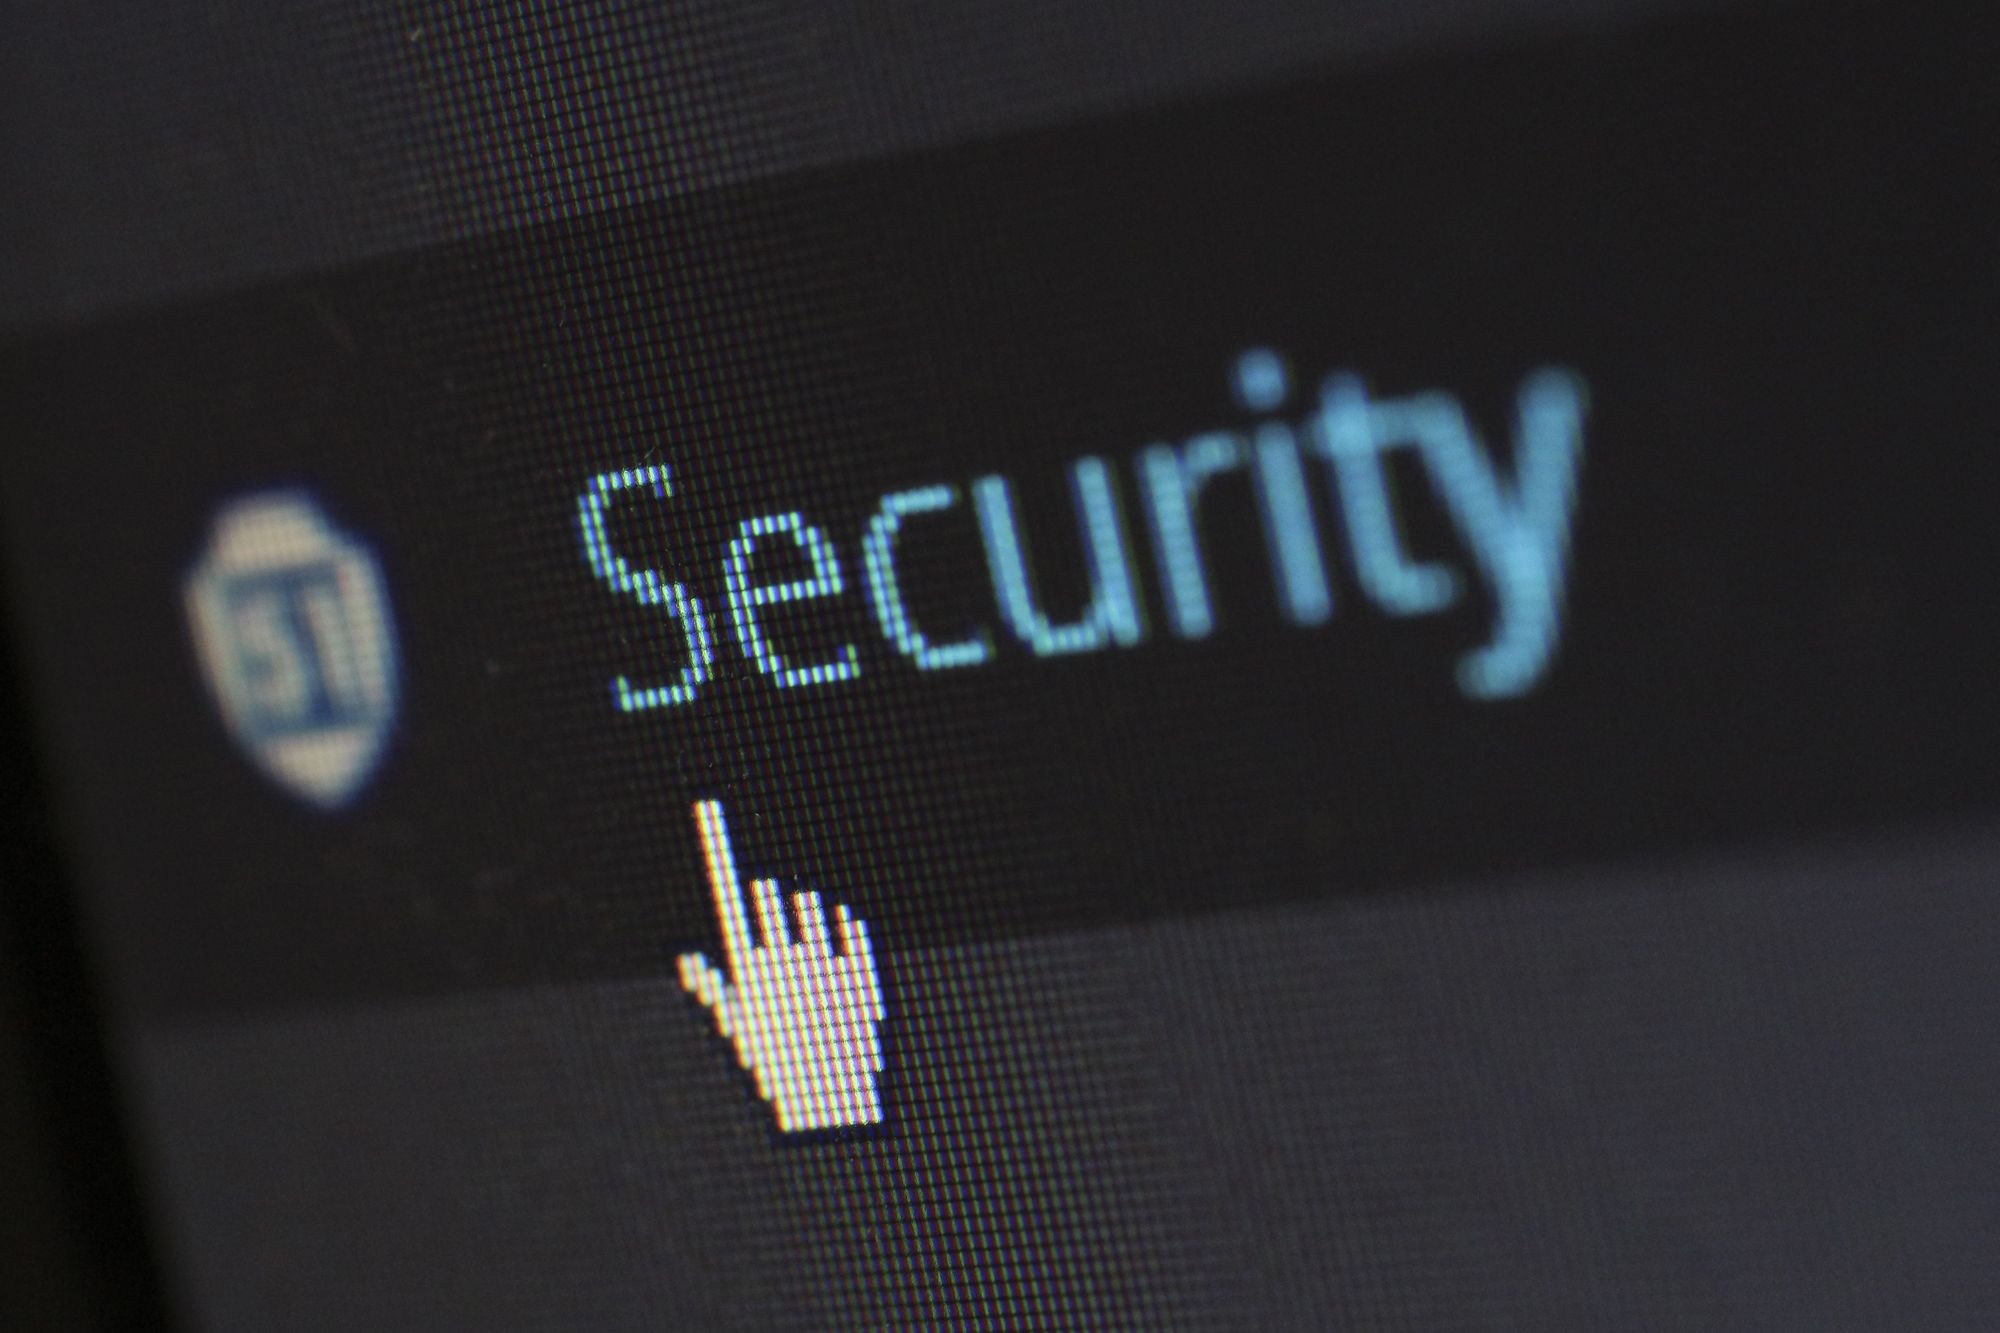 Valid SSL certs for local HTTPS webdev